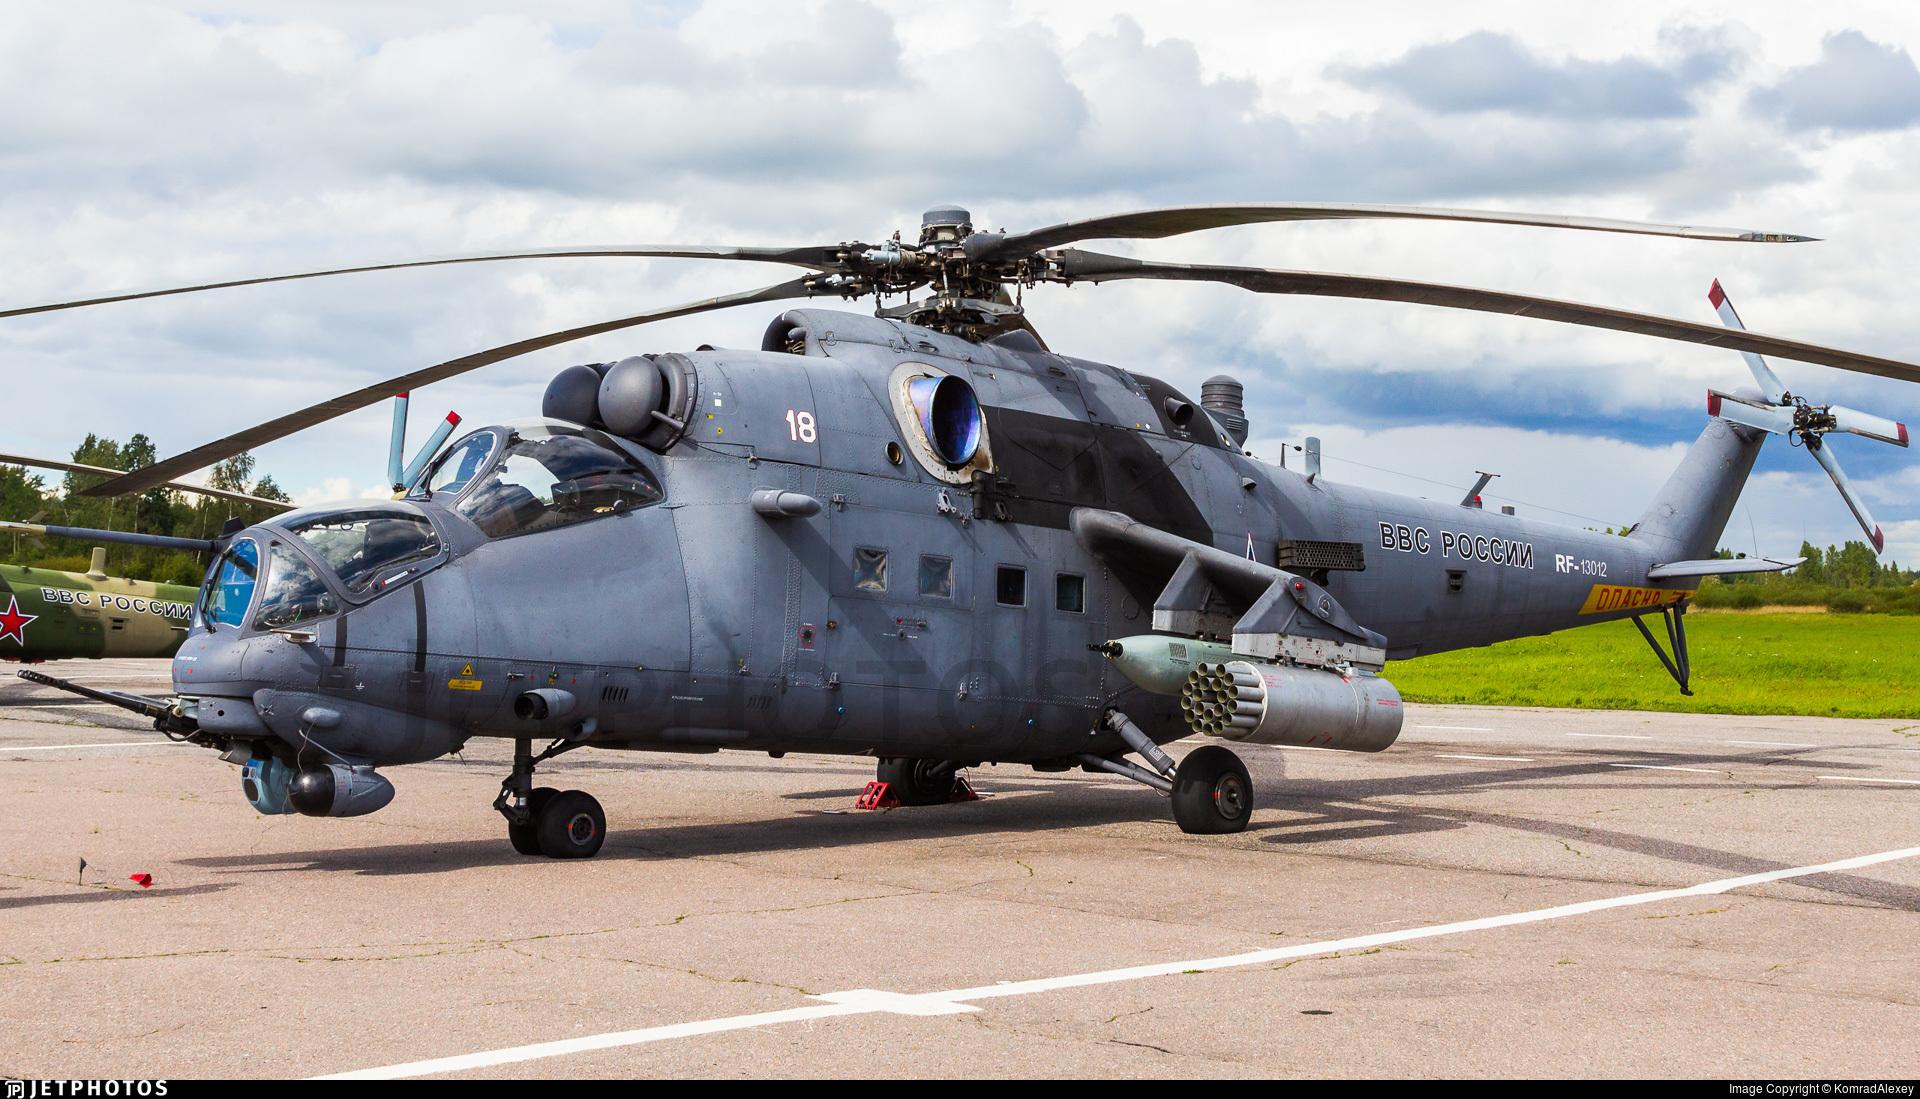 RF-13012 - Mil Mi-35M Hind - Russia - Air Force